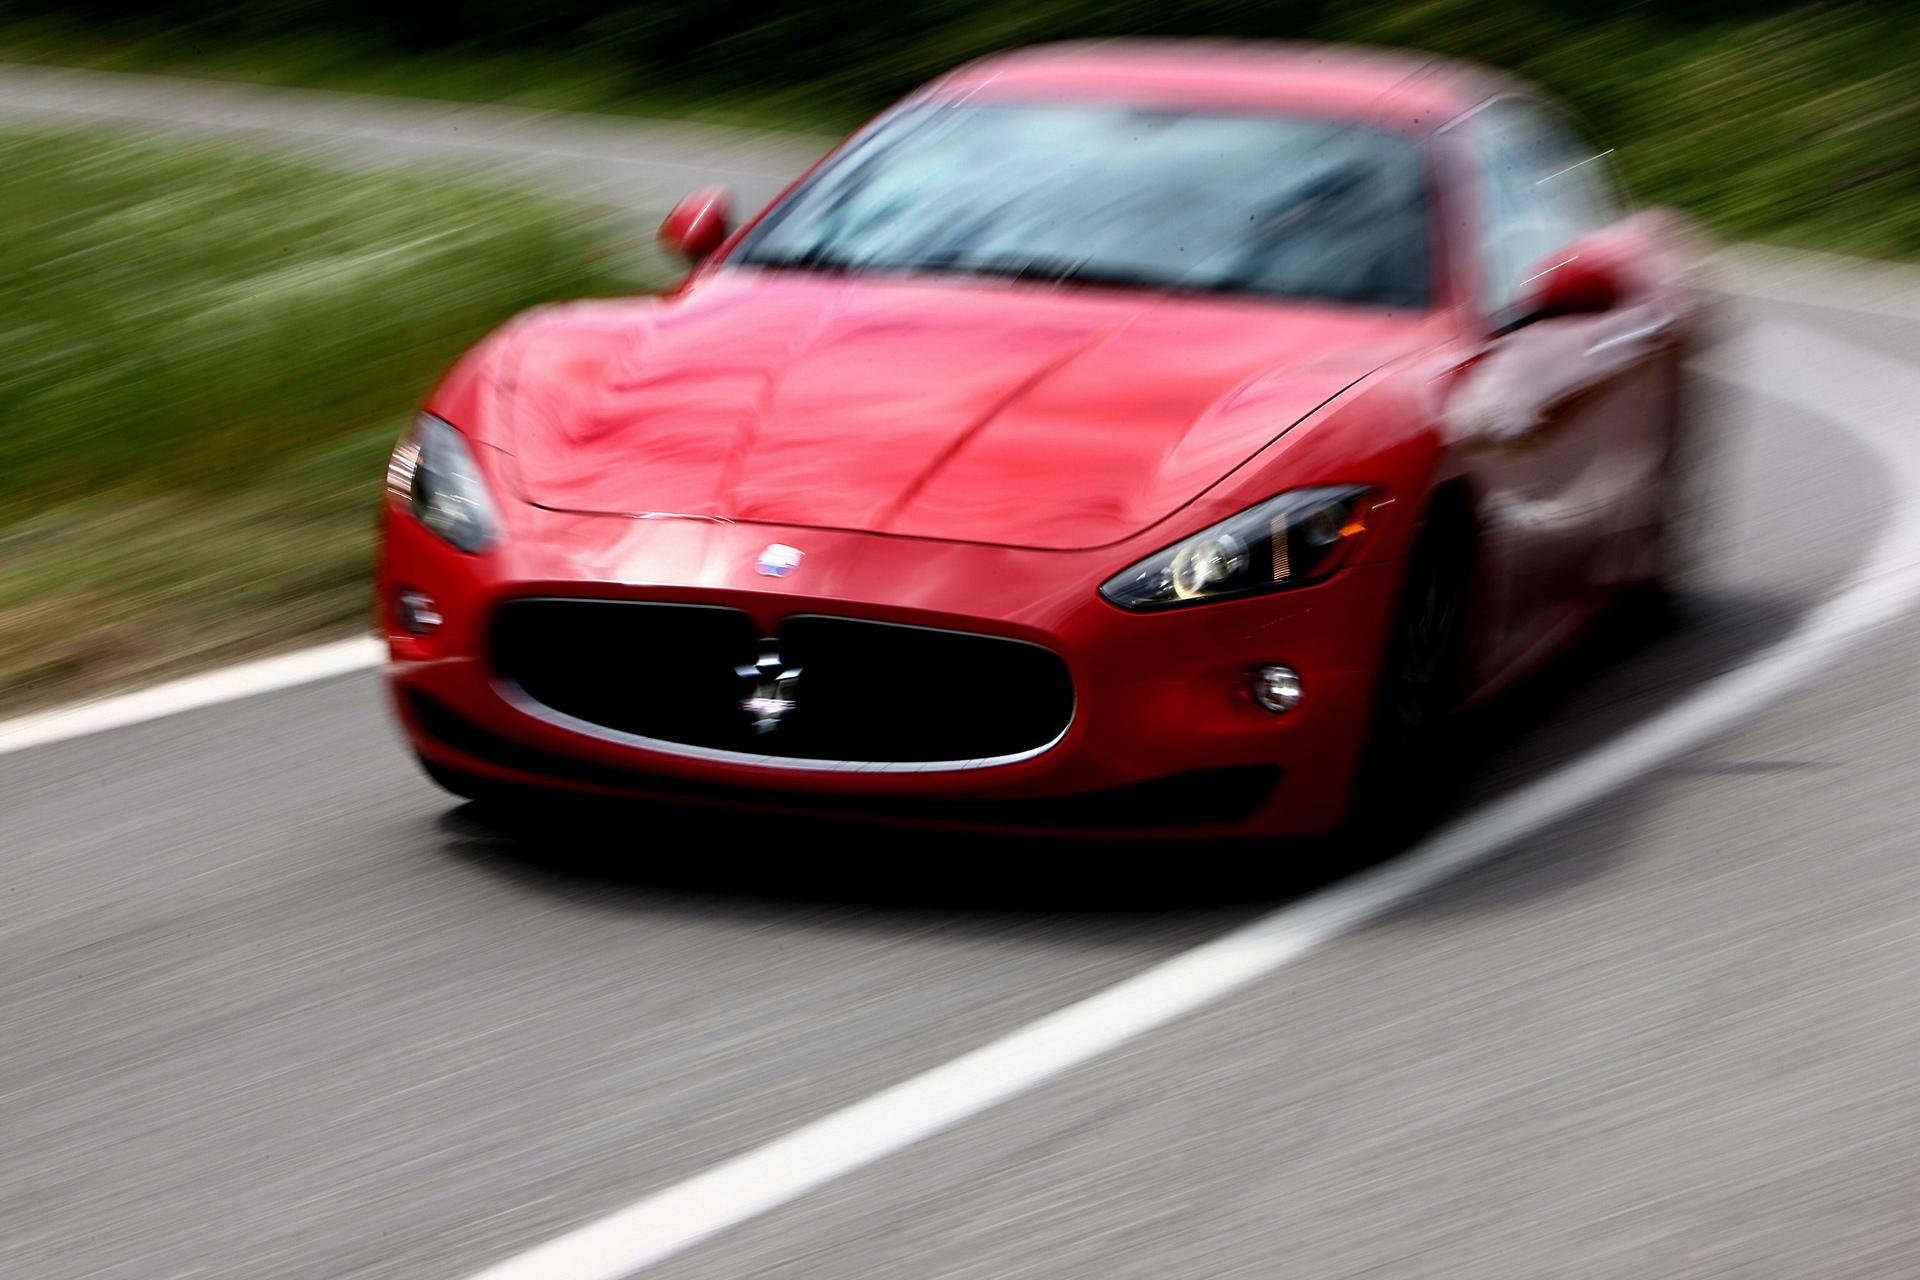 2016 Maserati GranTurismo © Fiat Chrysler Automobiles N.V.